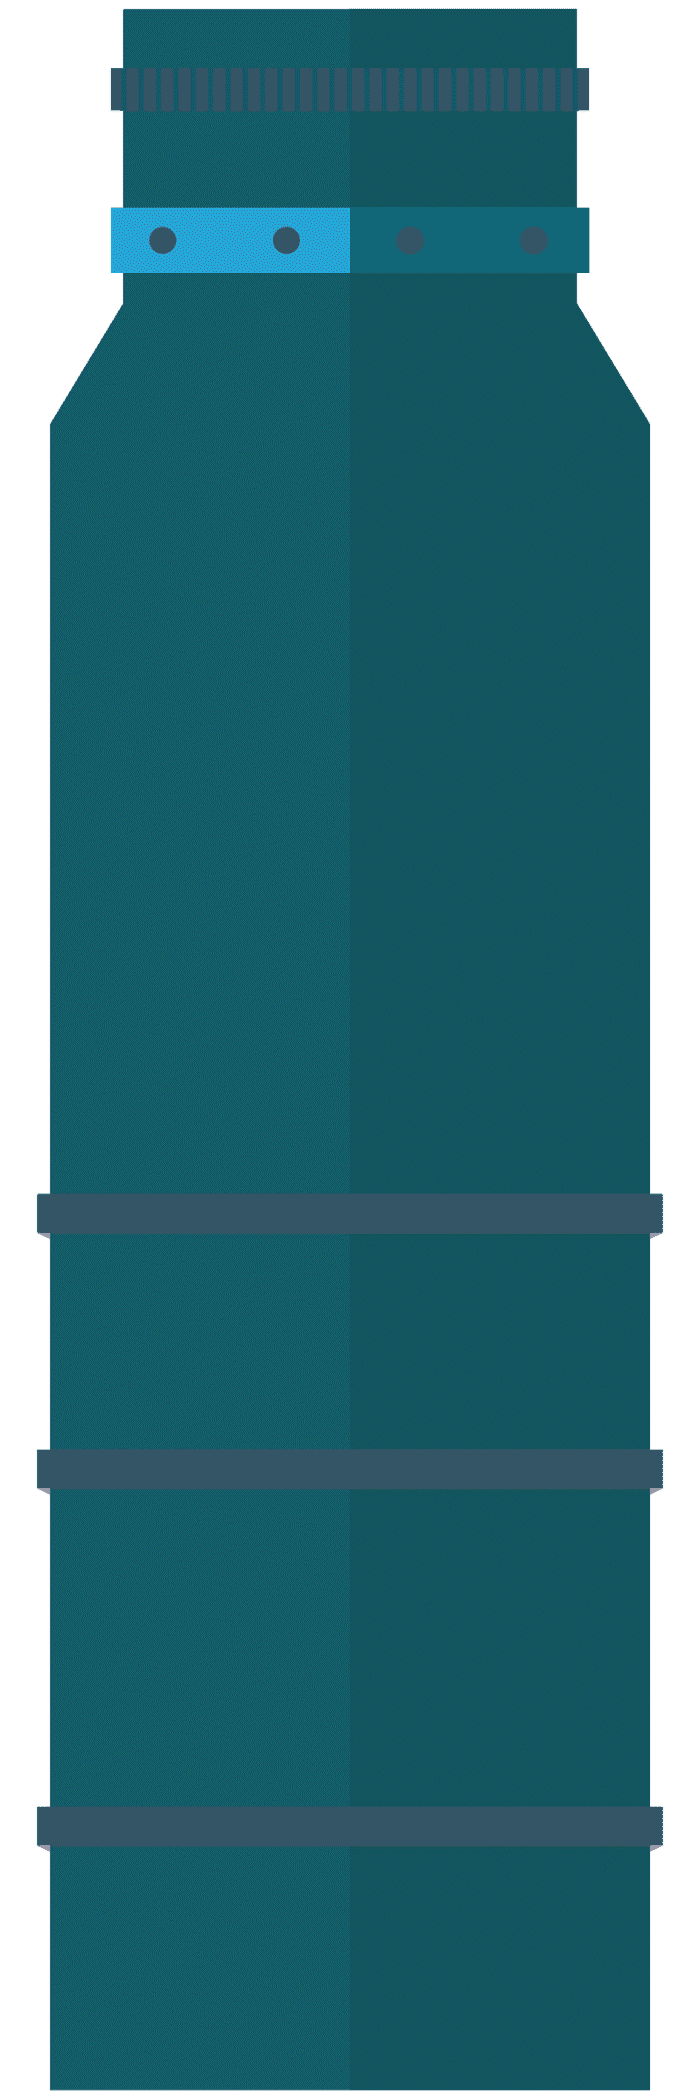 Azure, Rectangle, Aqua